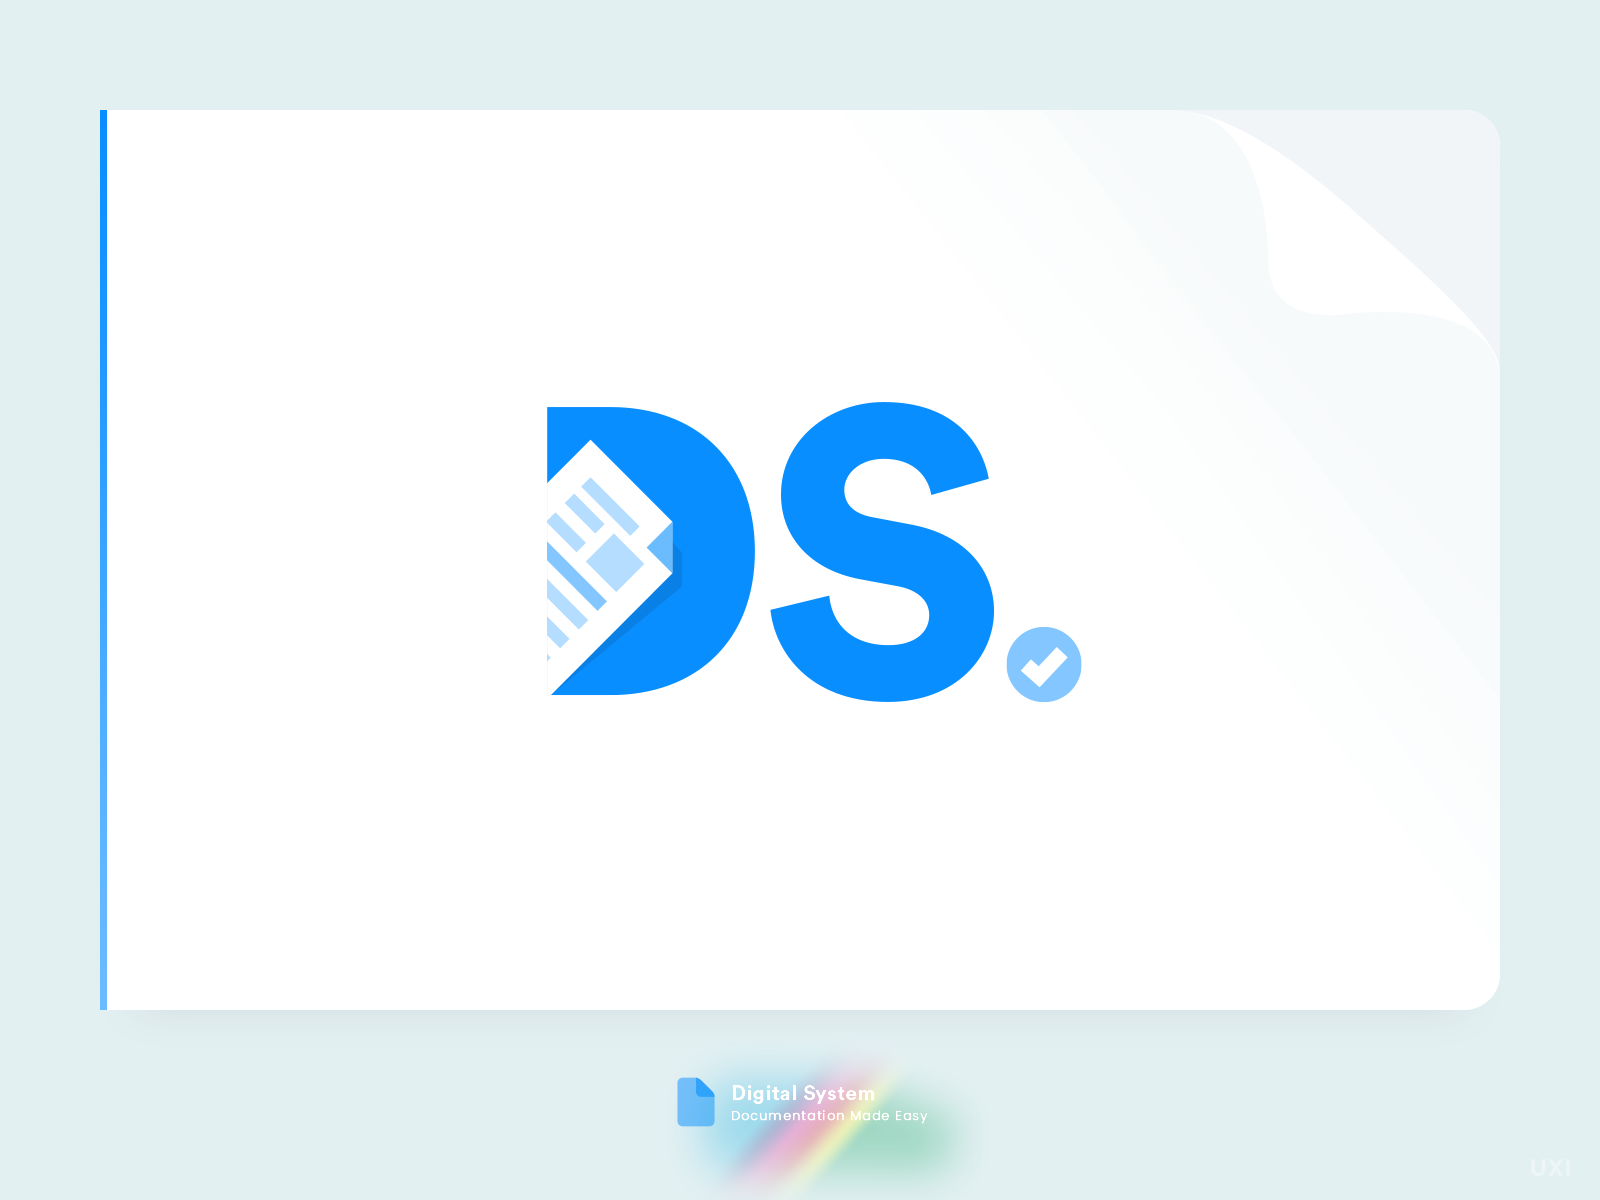 ds logo by jd on dribbble ds logo by jd on dribbble